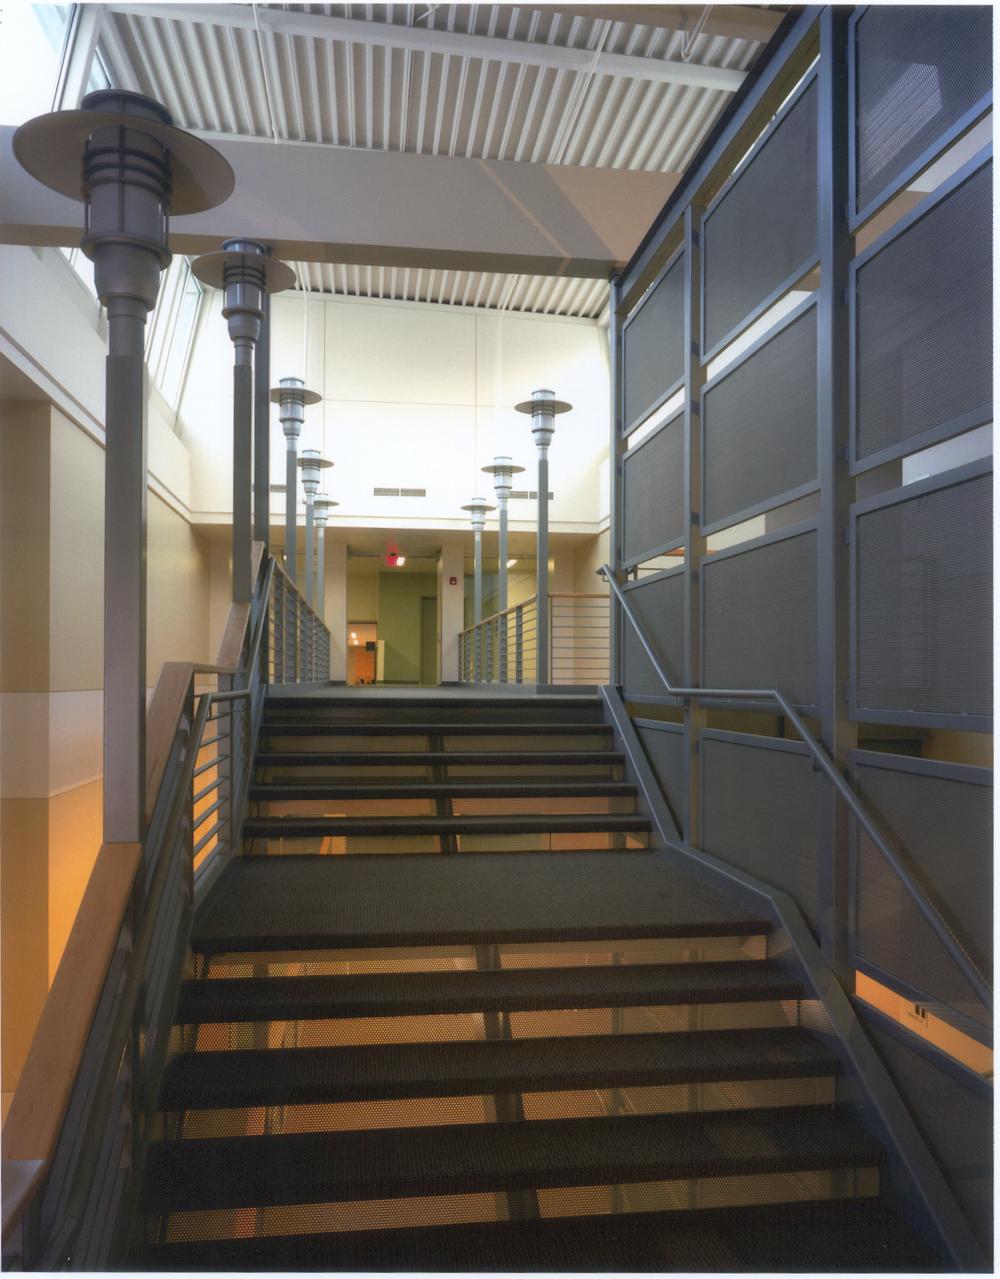 Interior Stairway.jpg